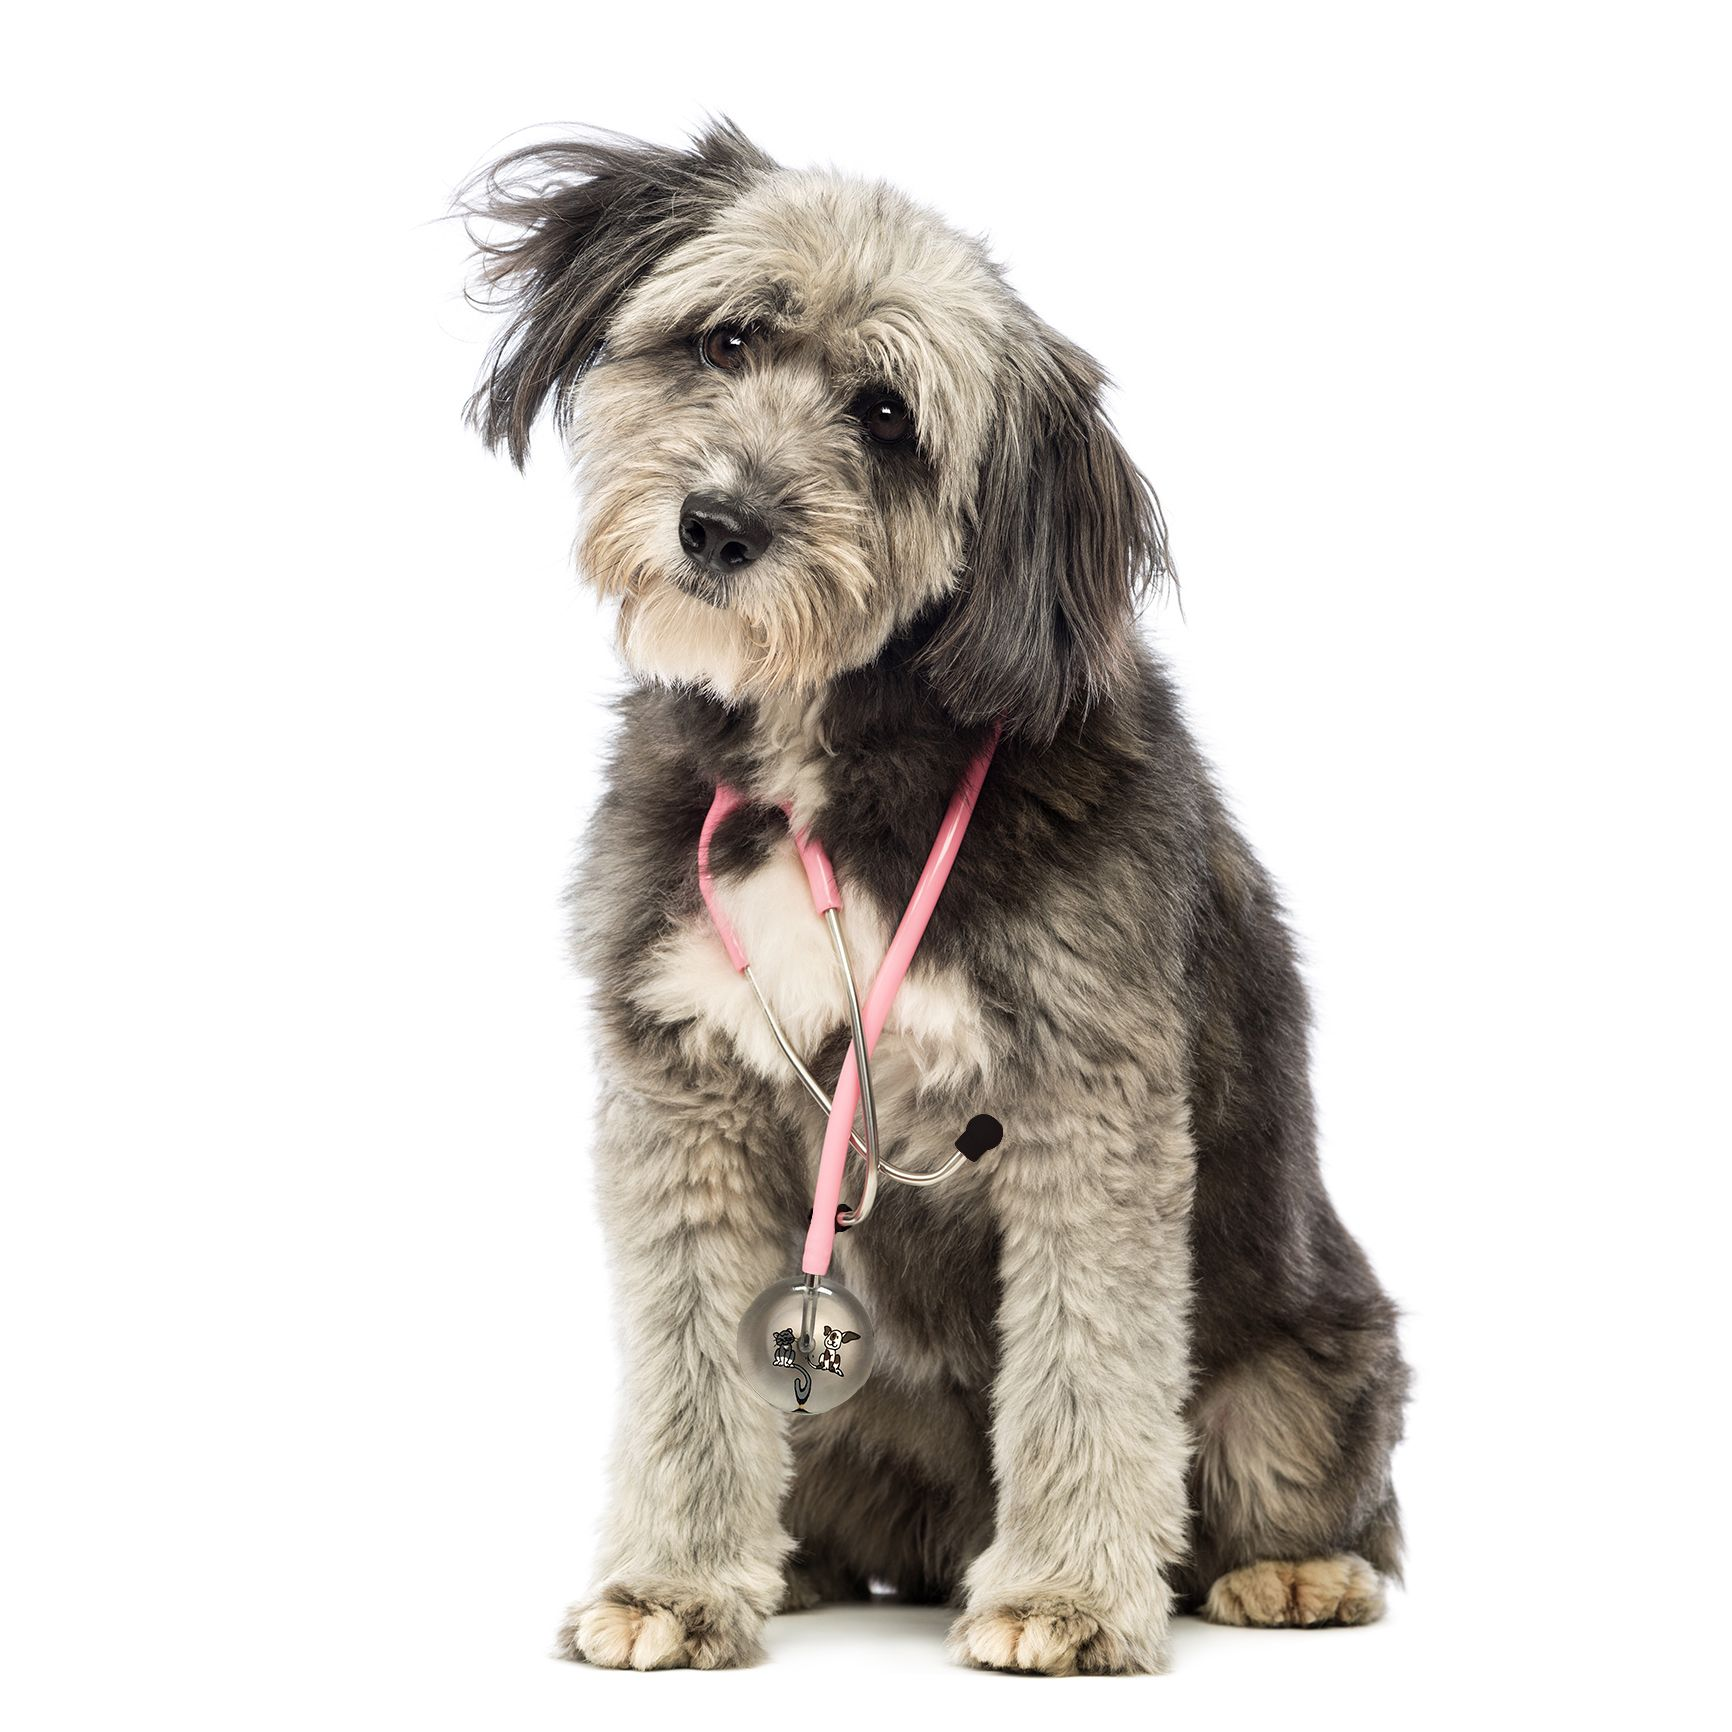 how to use a stethoscope on a dog